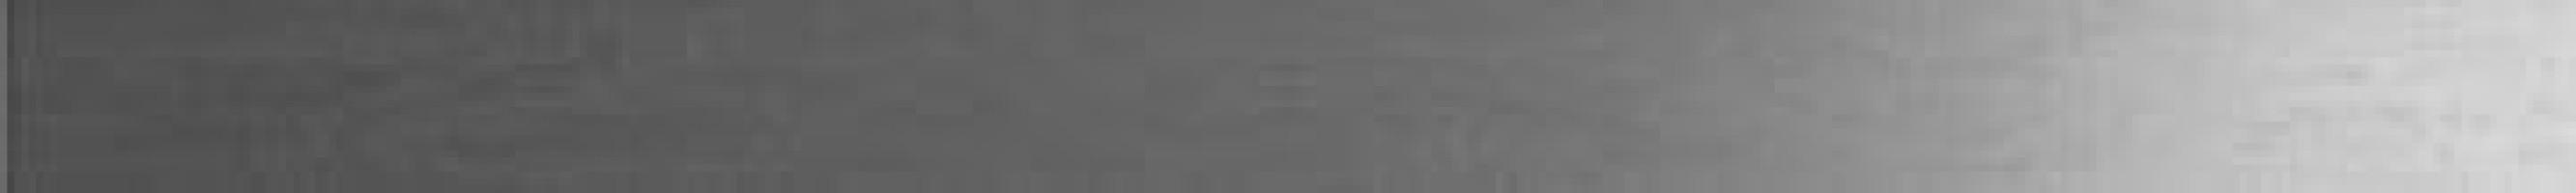 Бордюр 5150760МТ Forza Листелло матовое серебро 0.7x60 Creto